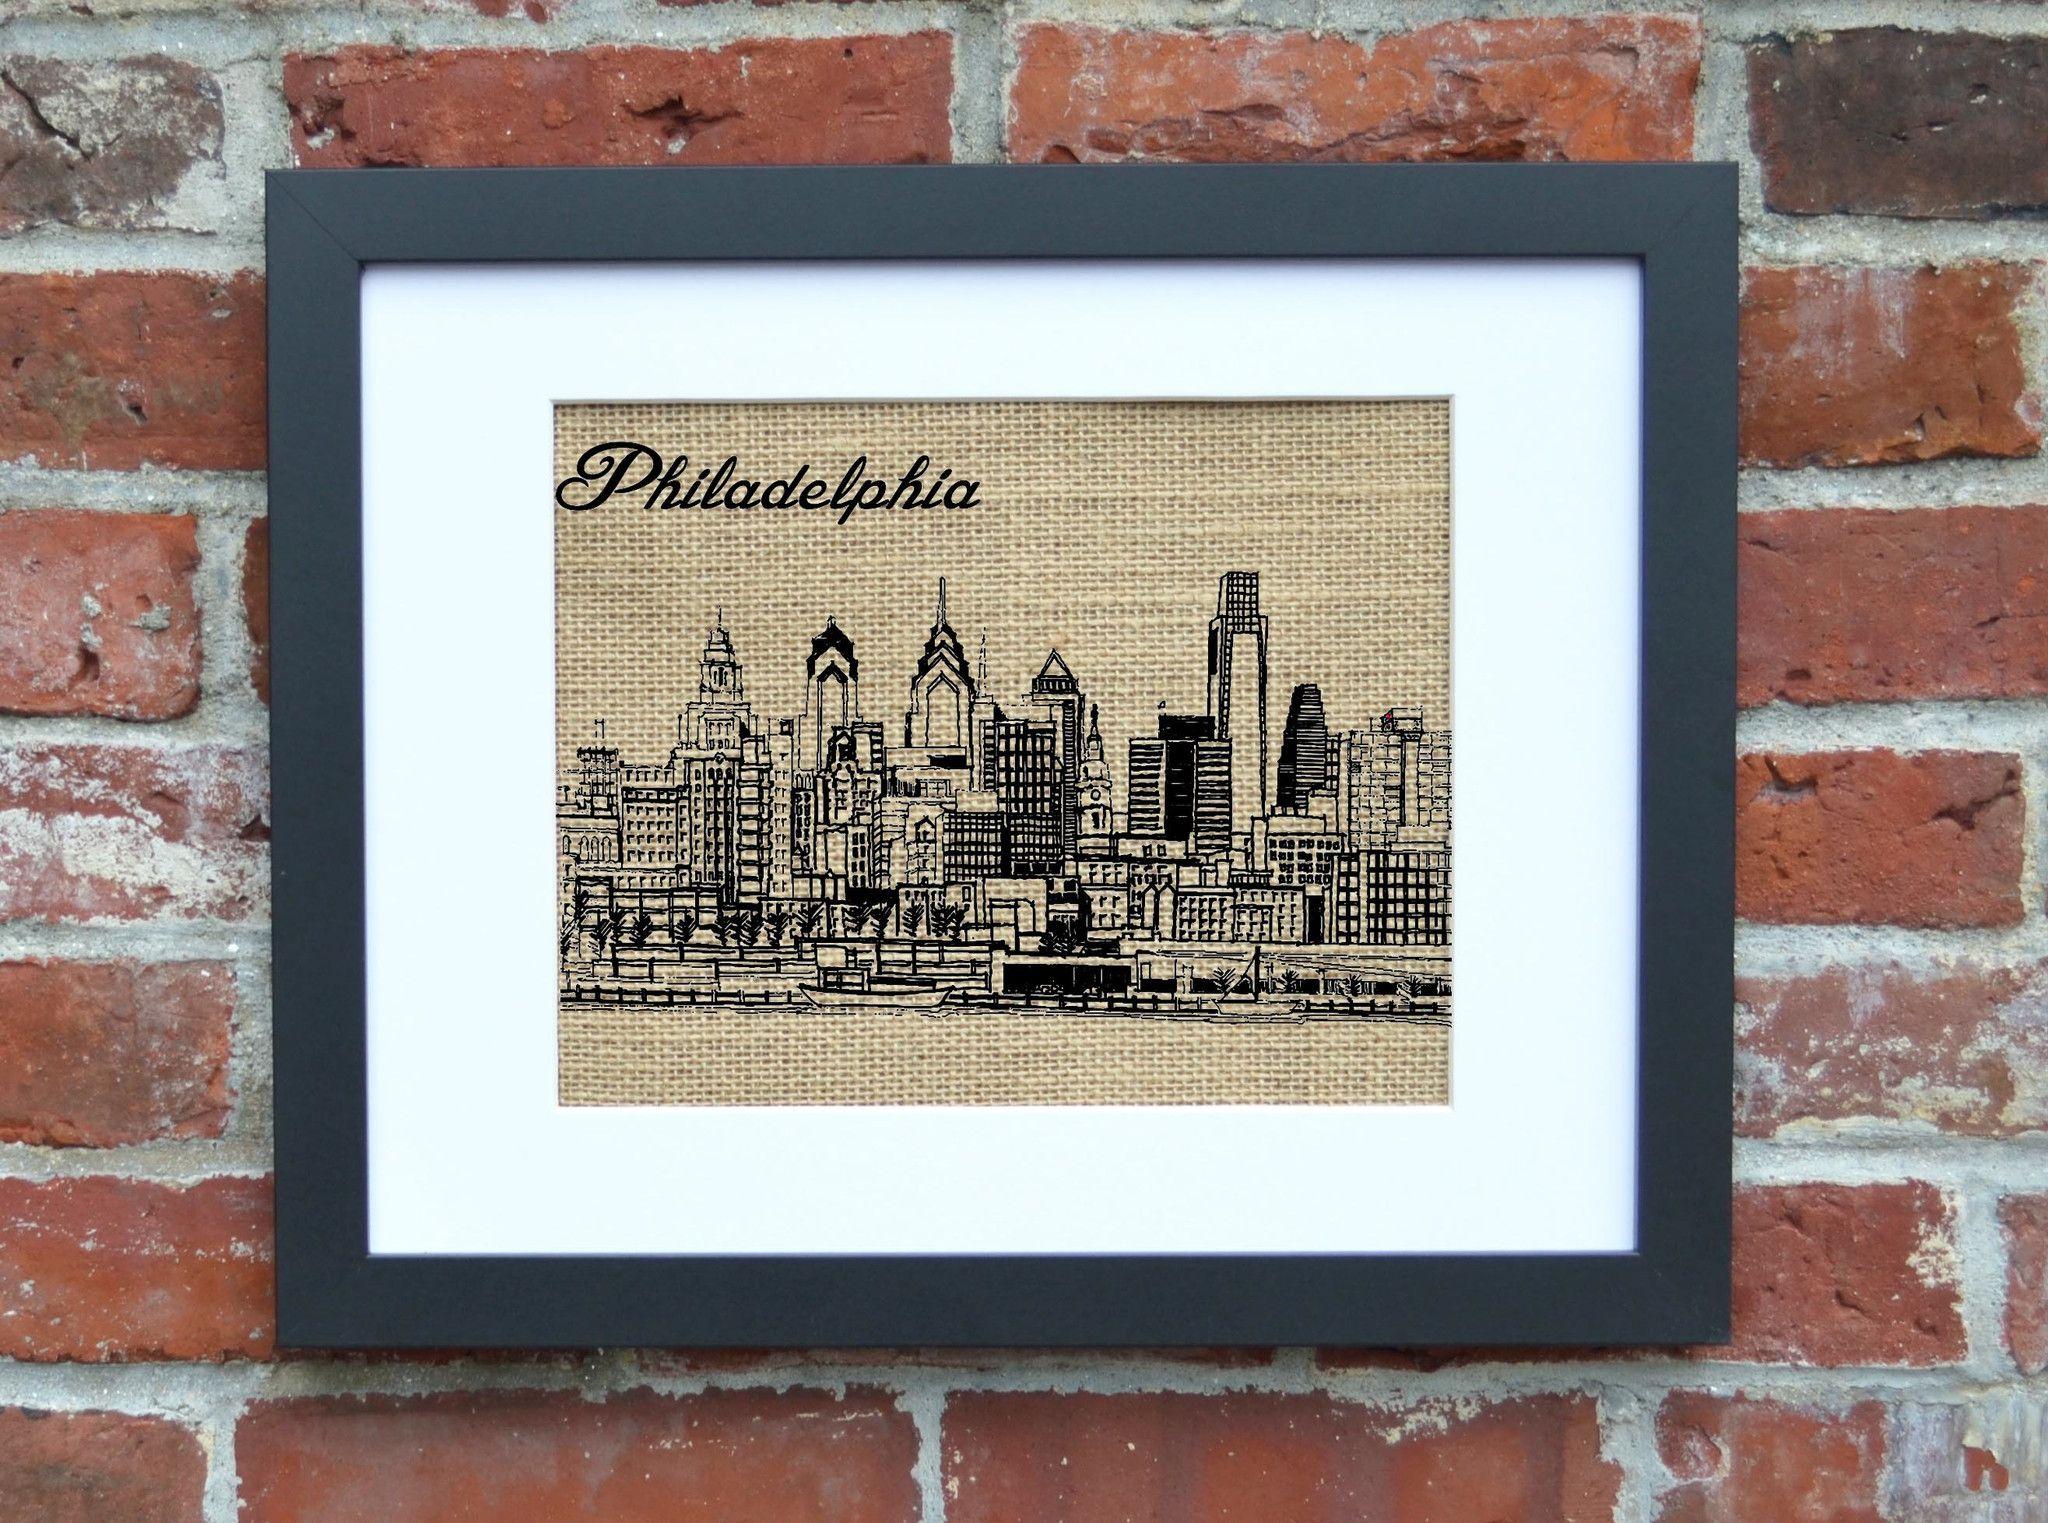 Philadelphia Phillies WinCraft Home Goods Gift Set